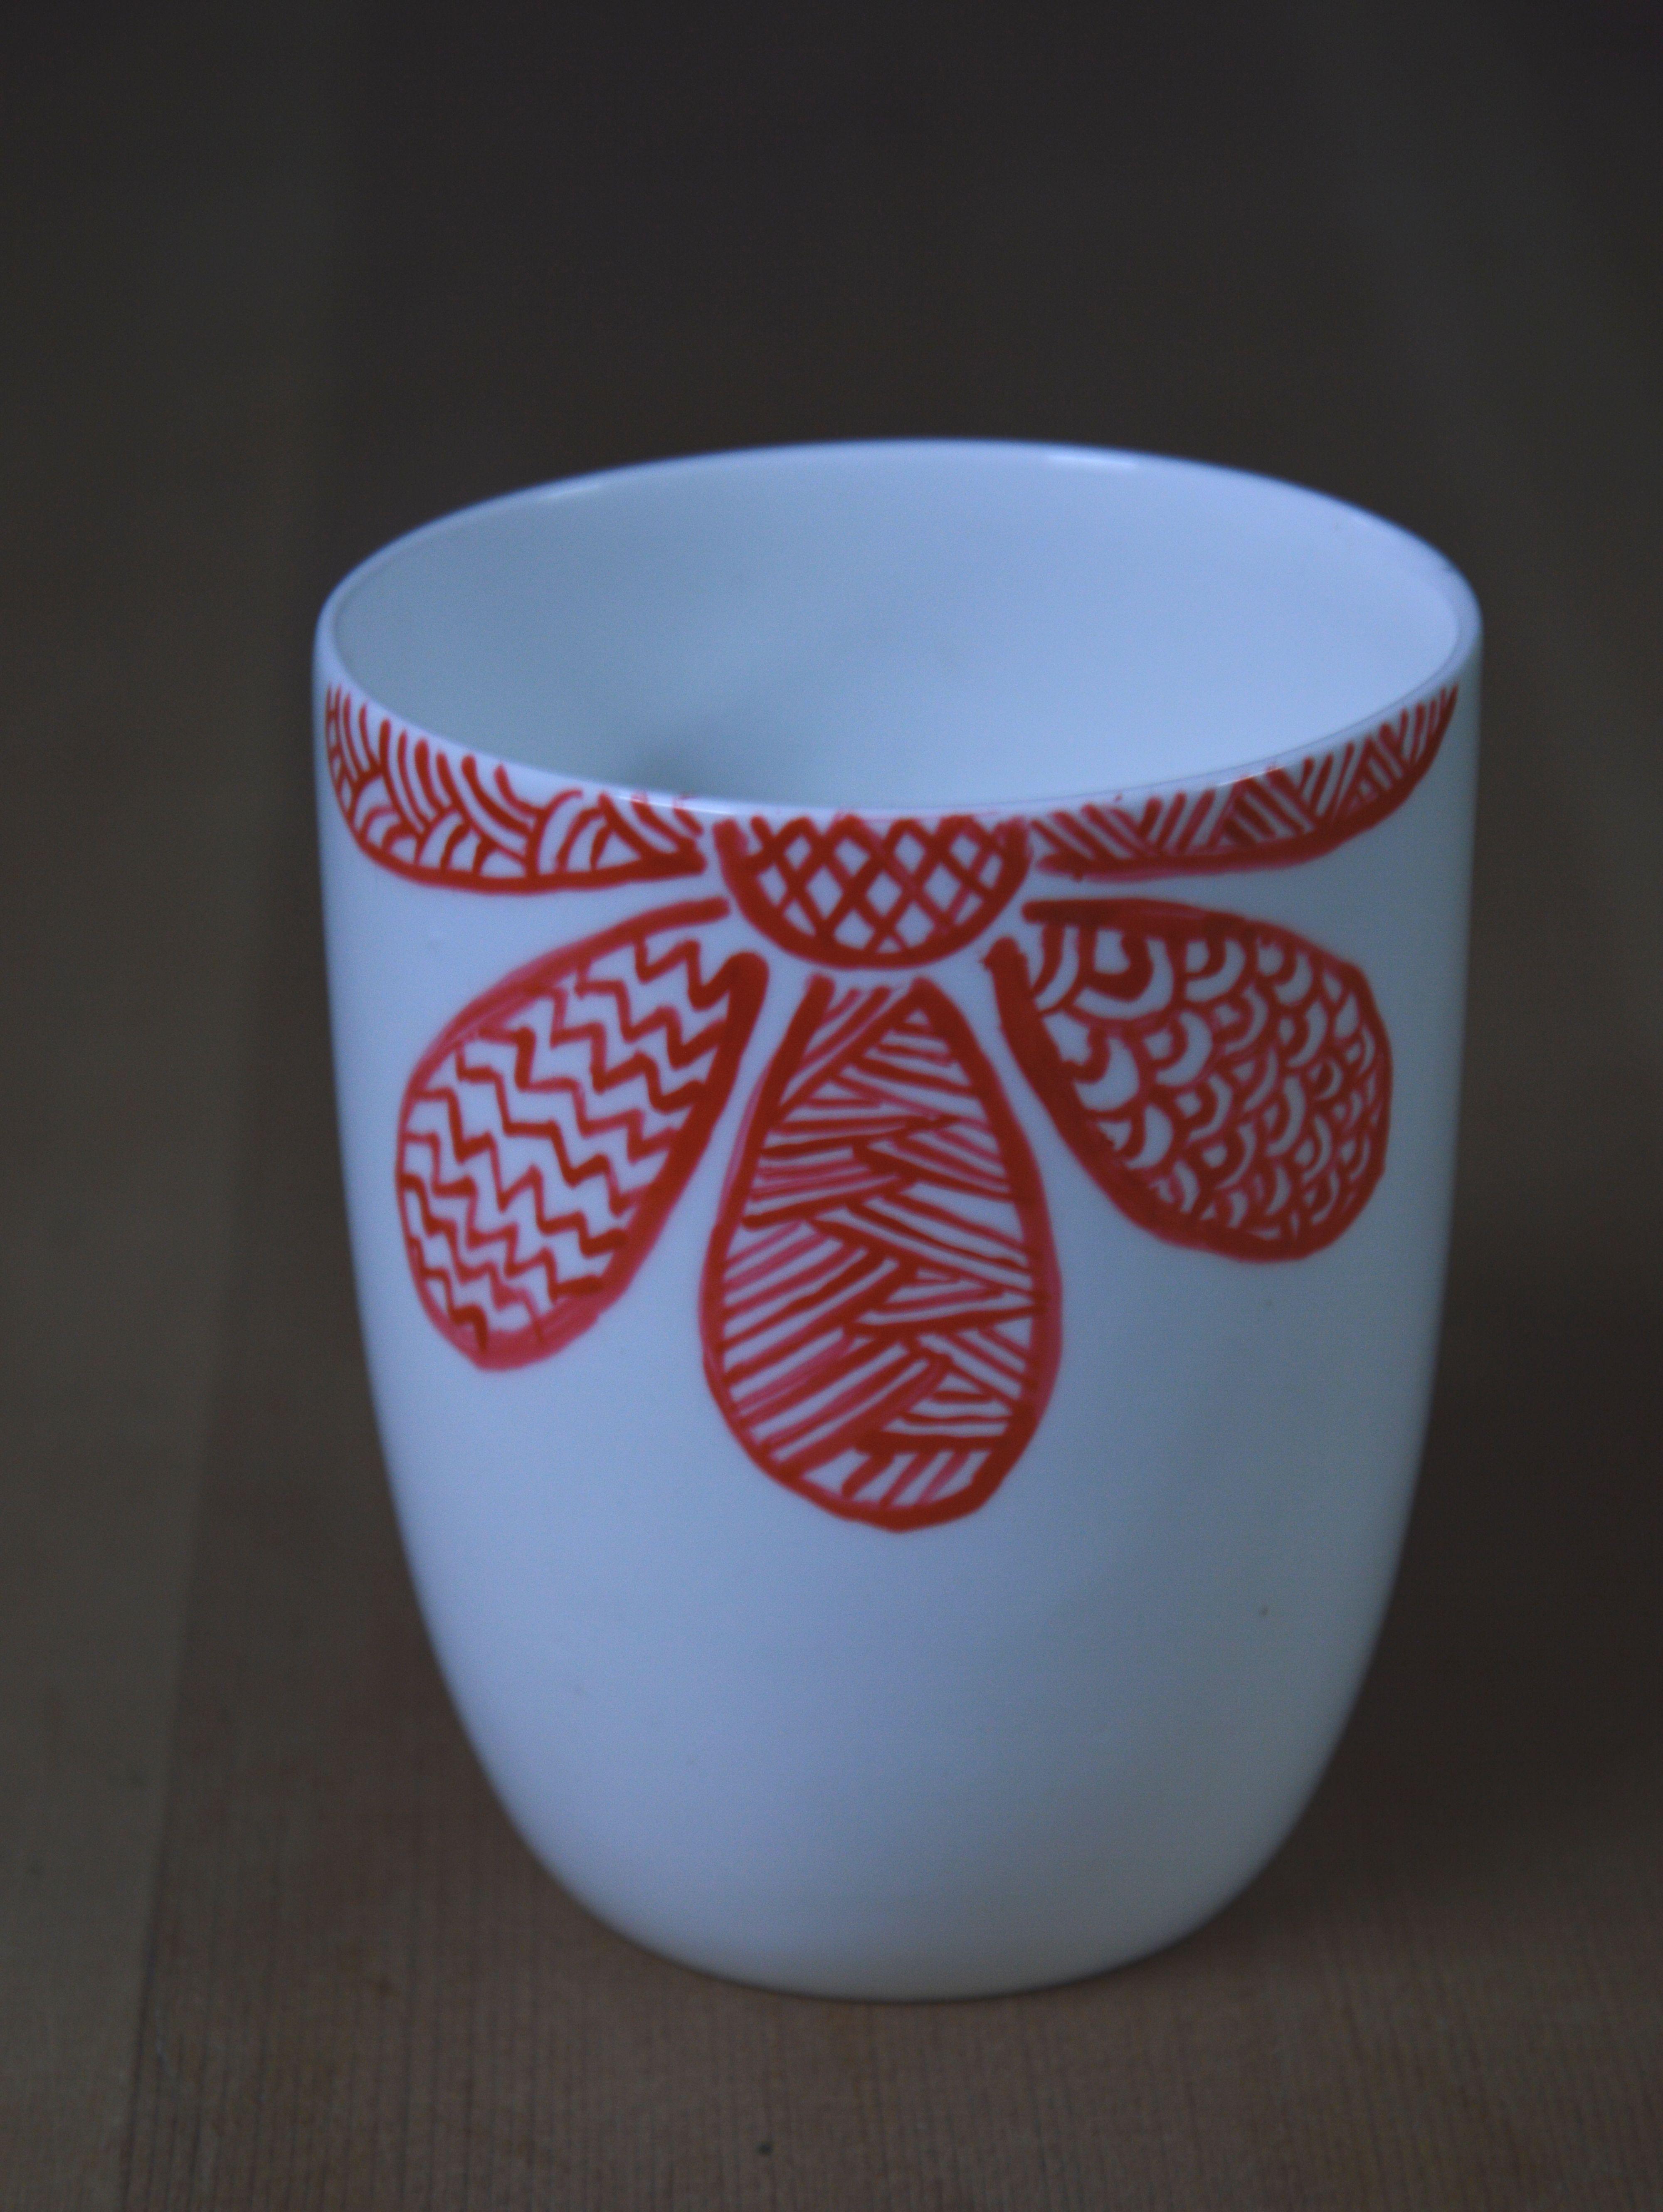 Pin by Krista McClure on EuphoRHEA Hand Painted Diy mugs